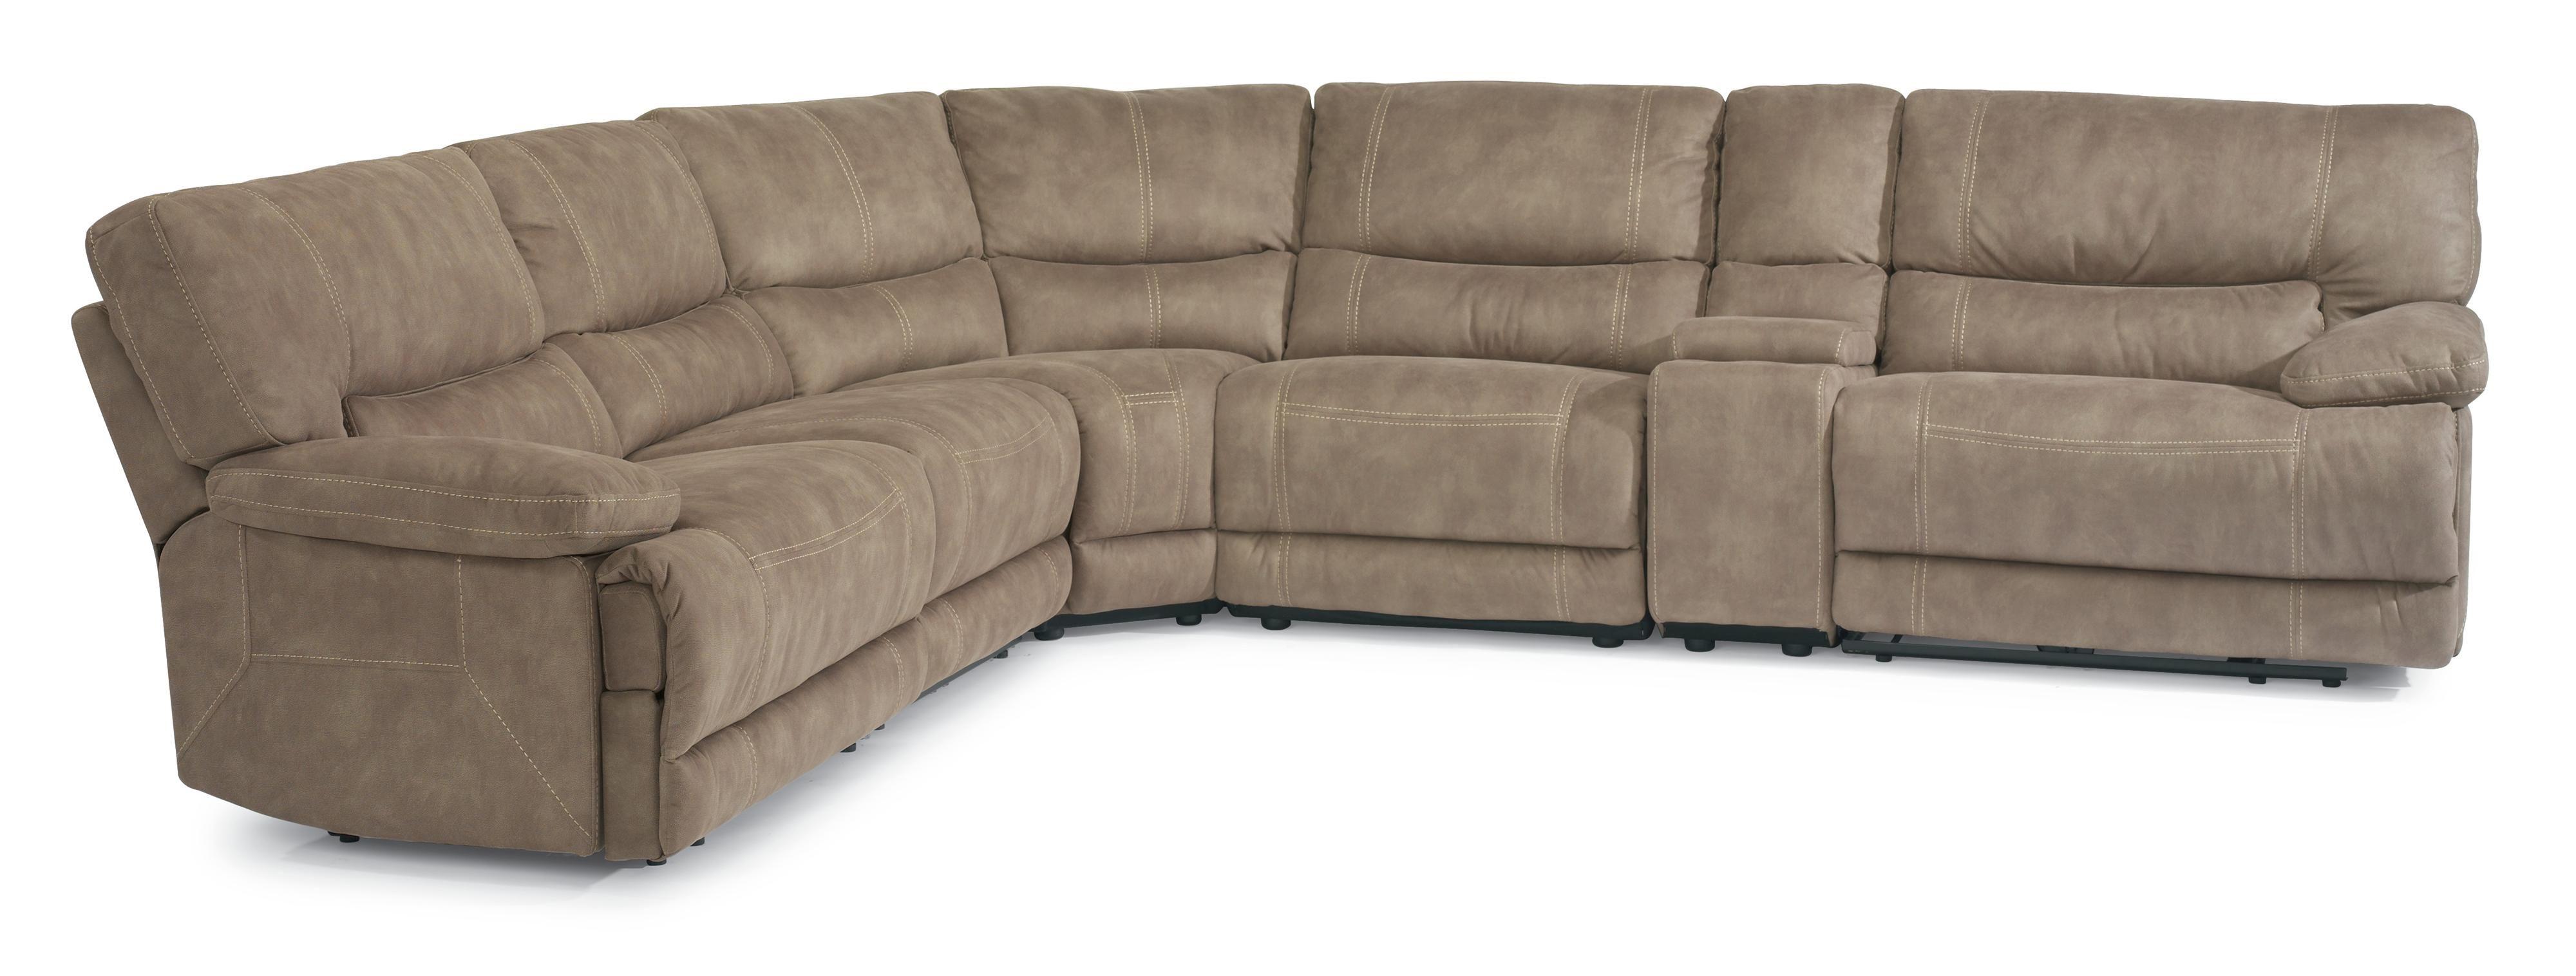 Latitudes Delia Reclining Sectional Sofa With Plush Pillow Arms